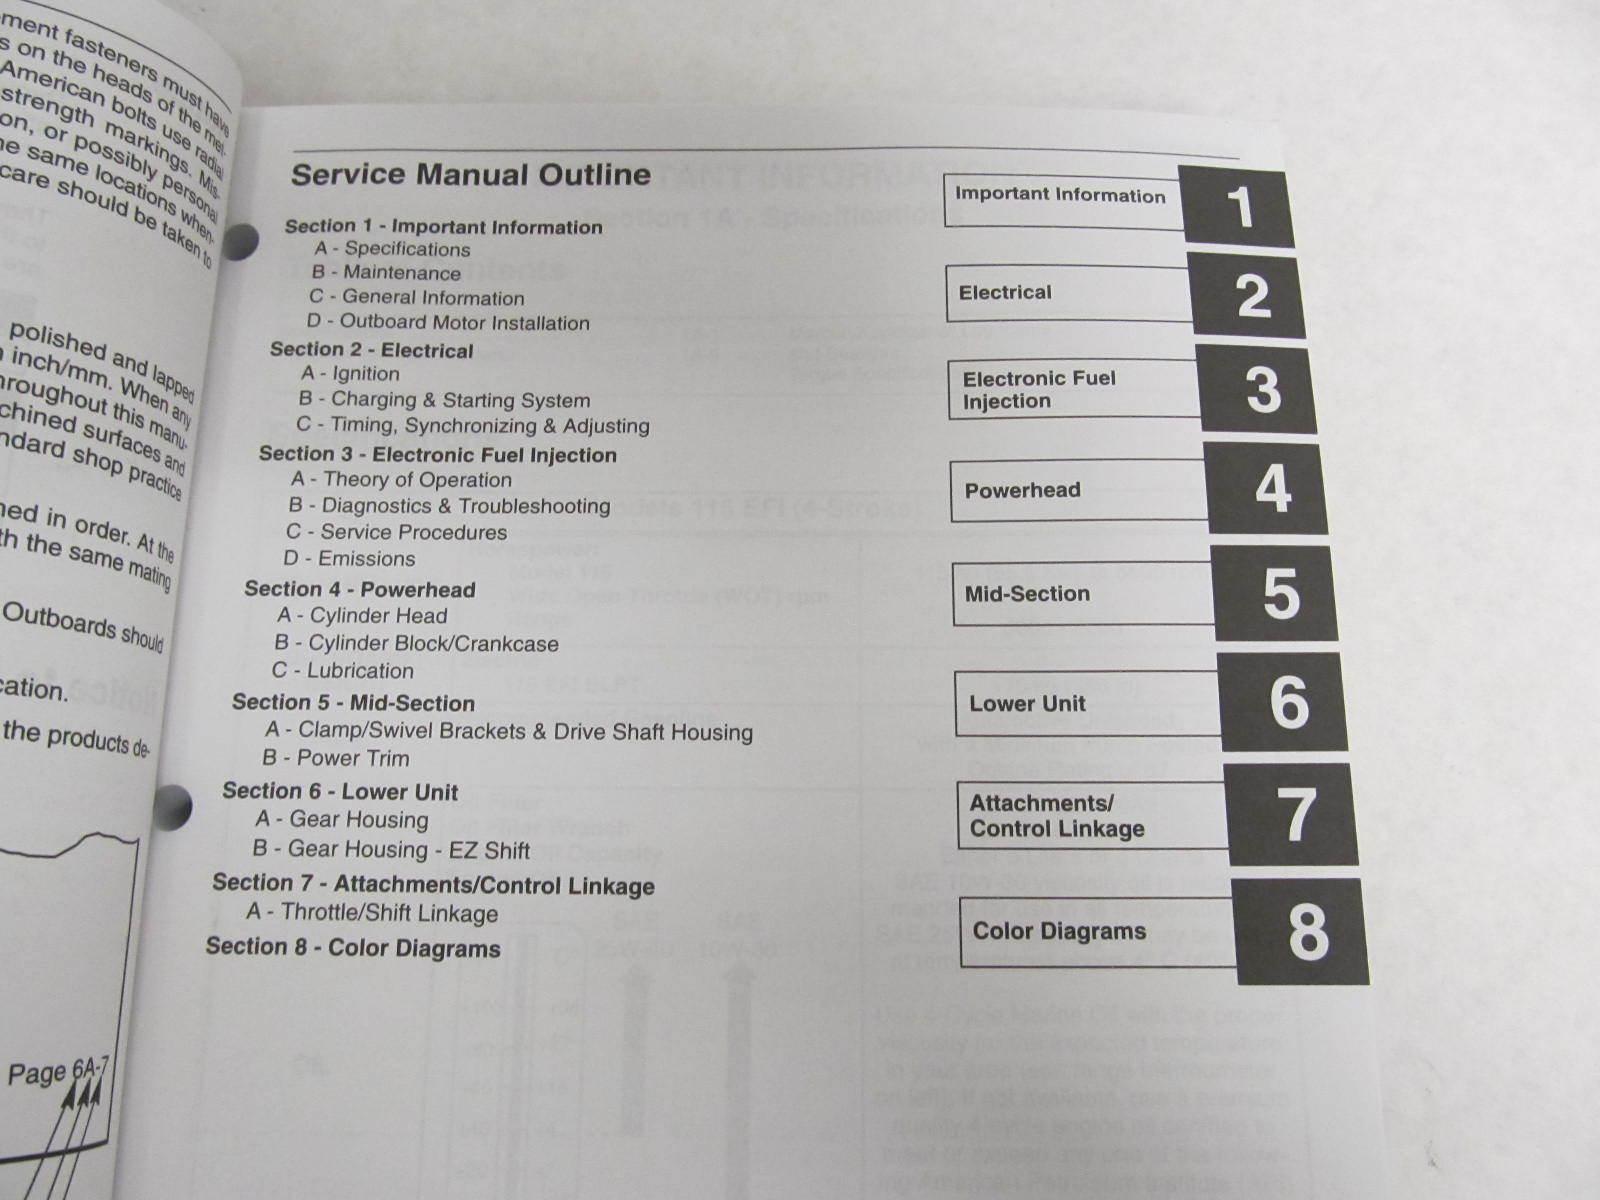 Mercury Outboard Service Manual 115 Hp 4 Manual Guide